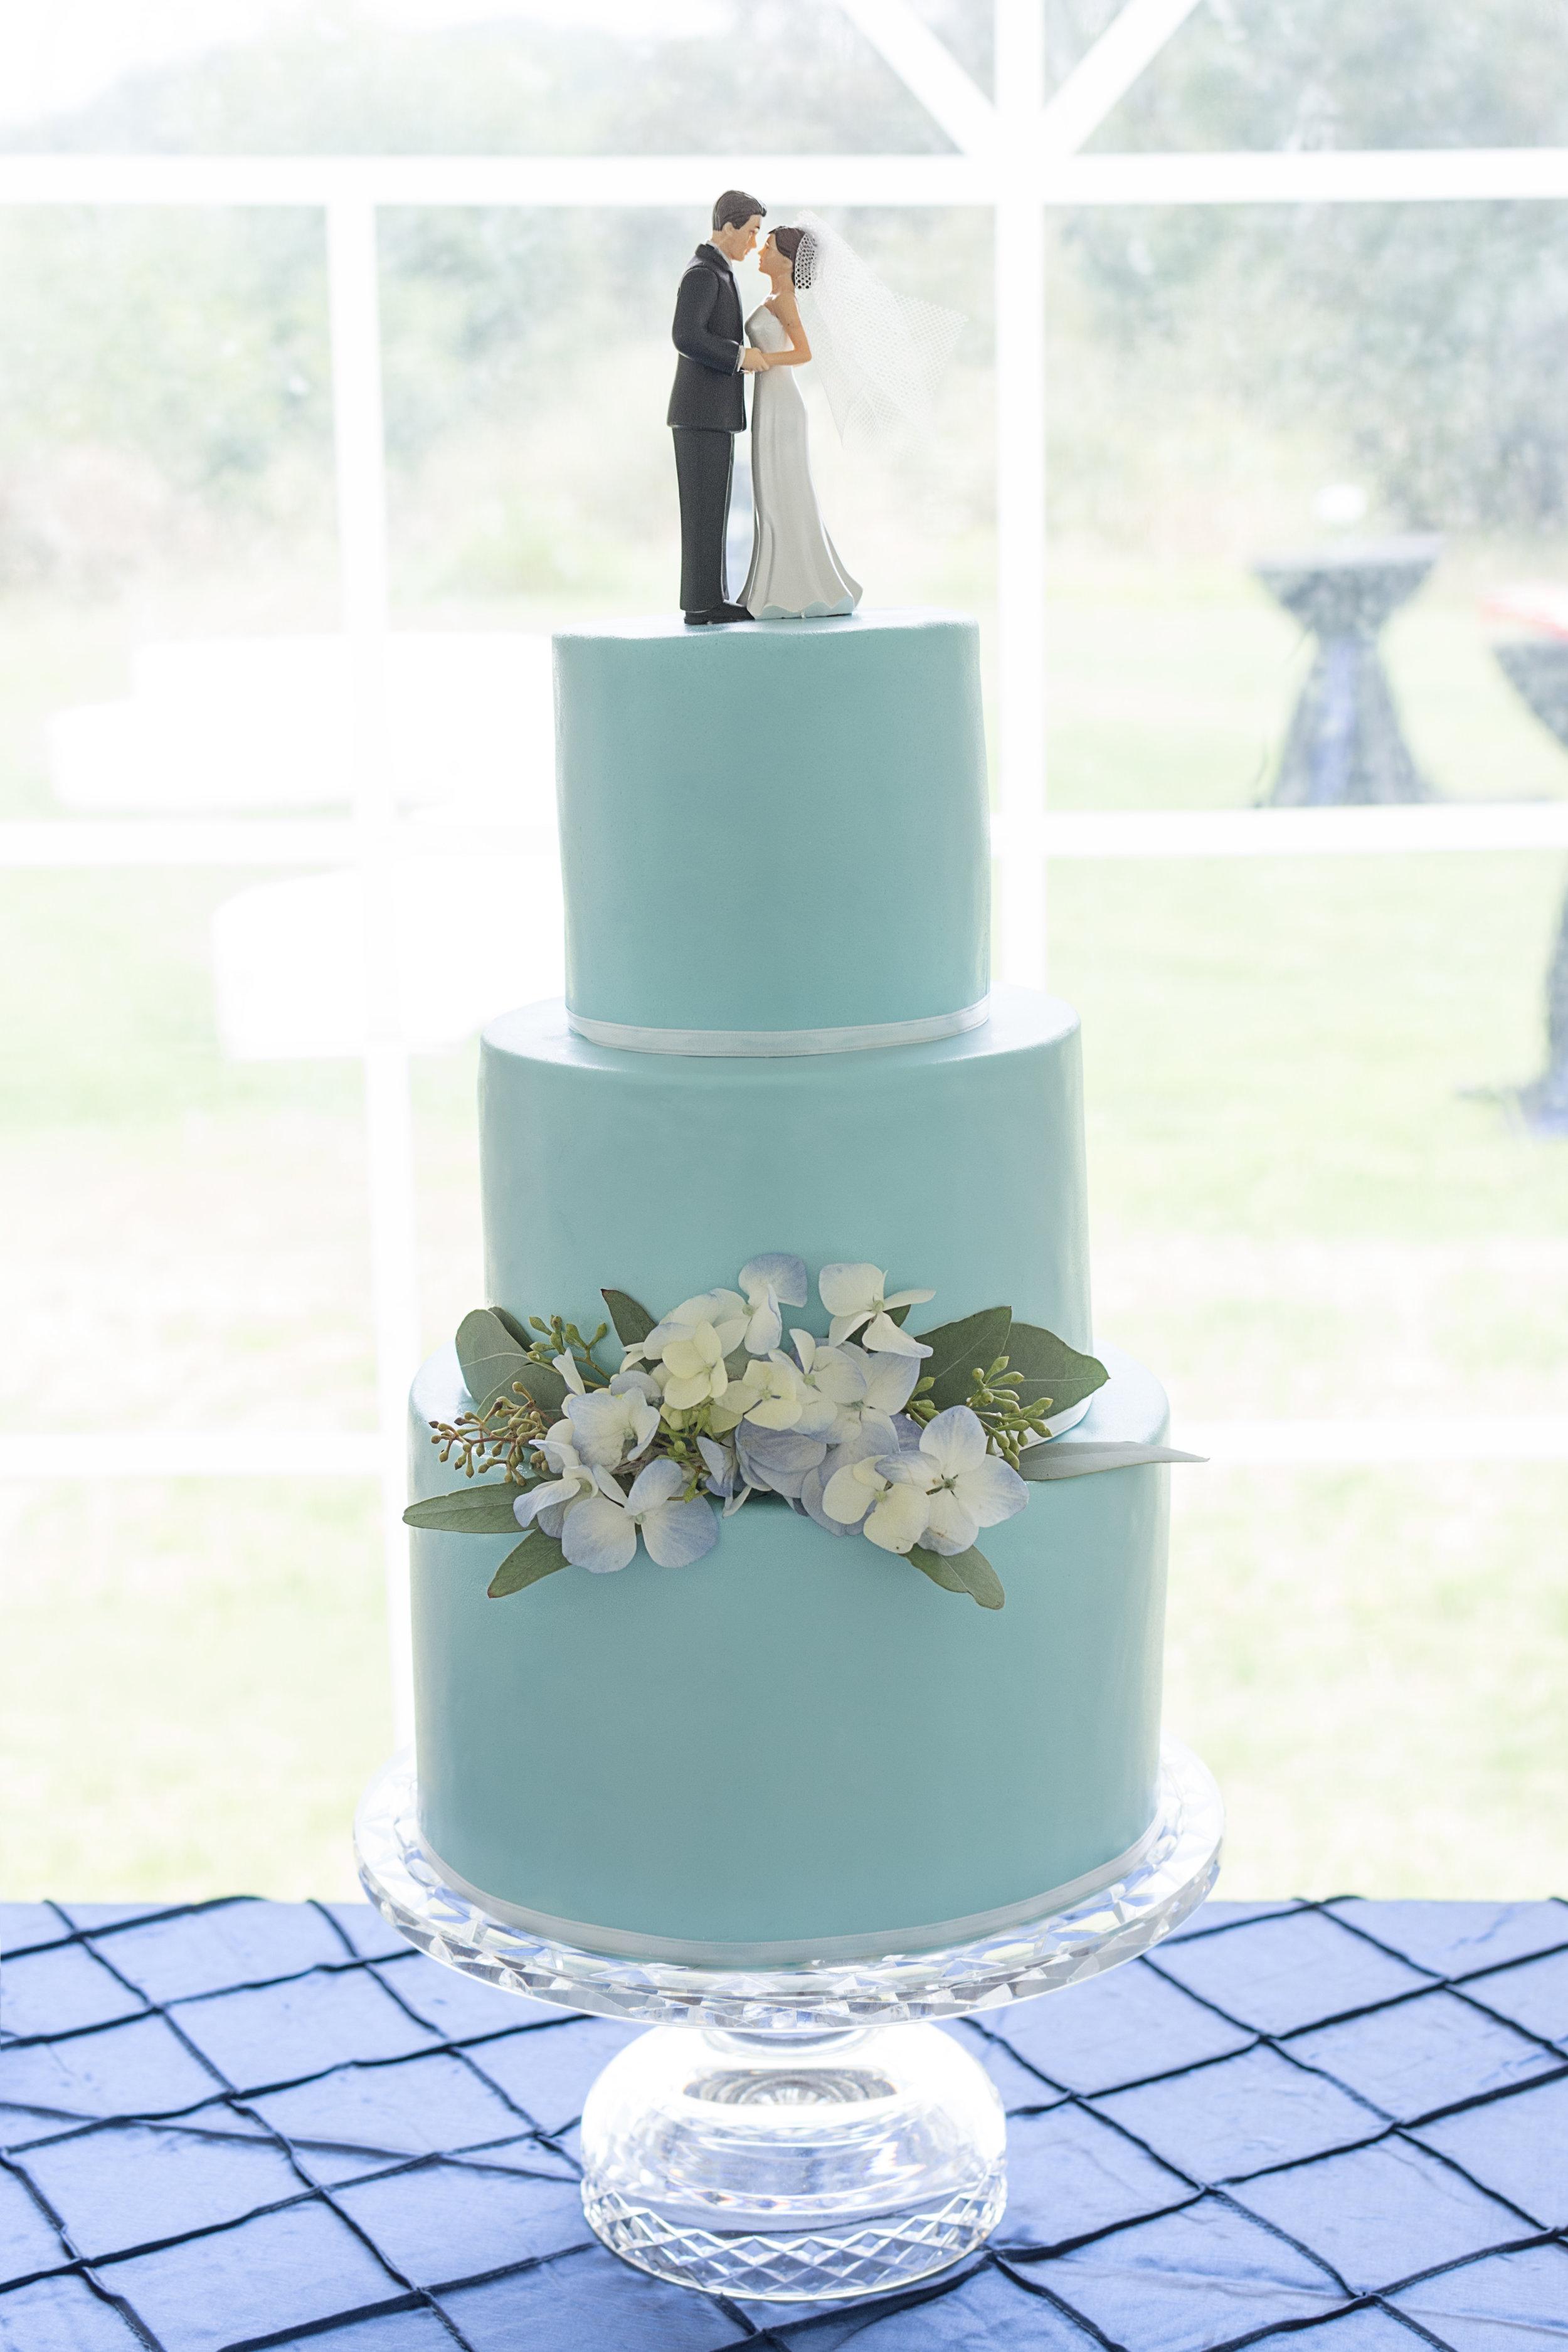 Blue Wedding Cake 9-2-17.jpg